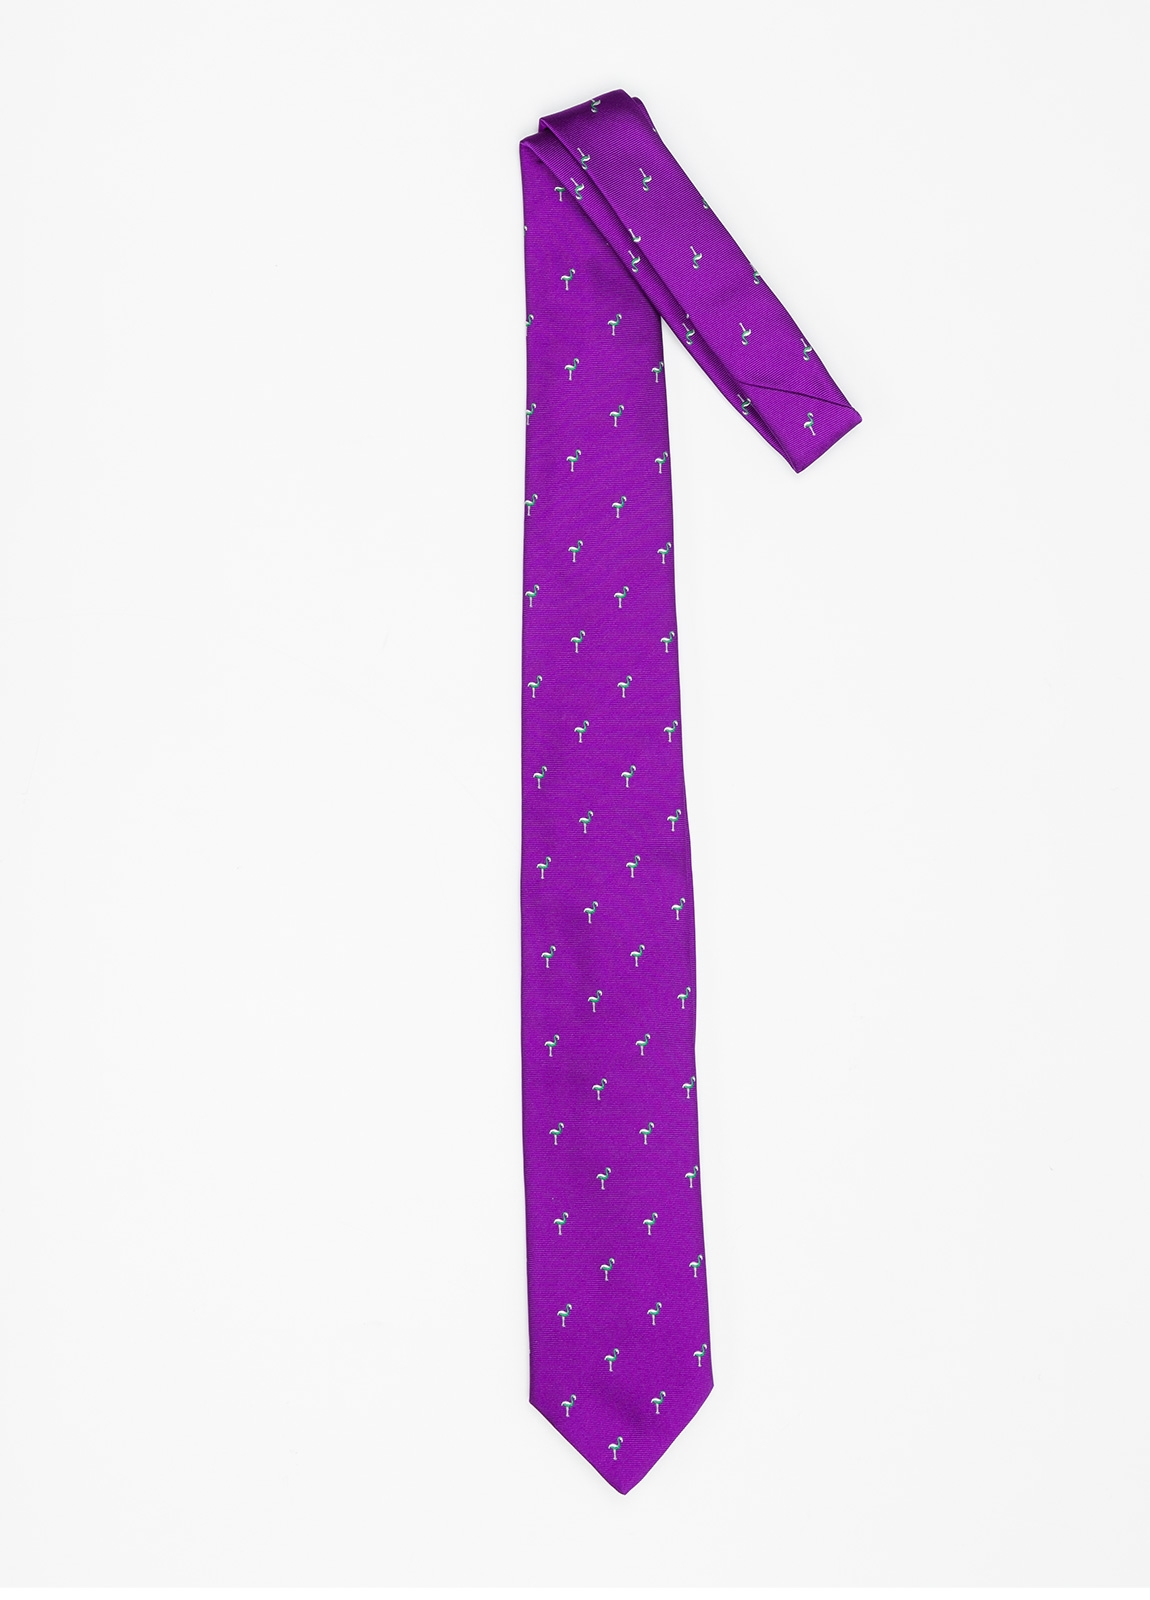 Corbata Formal Wear dibujo flamencos color lila. Pala 7,5 cm. 100% Seda. - Ítem1